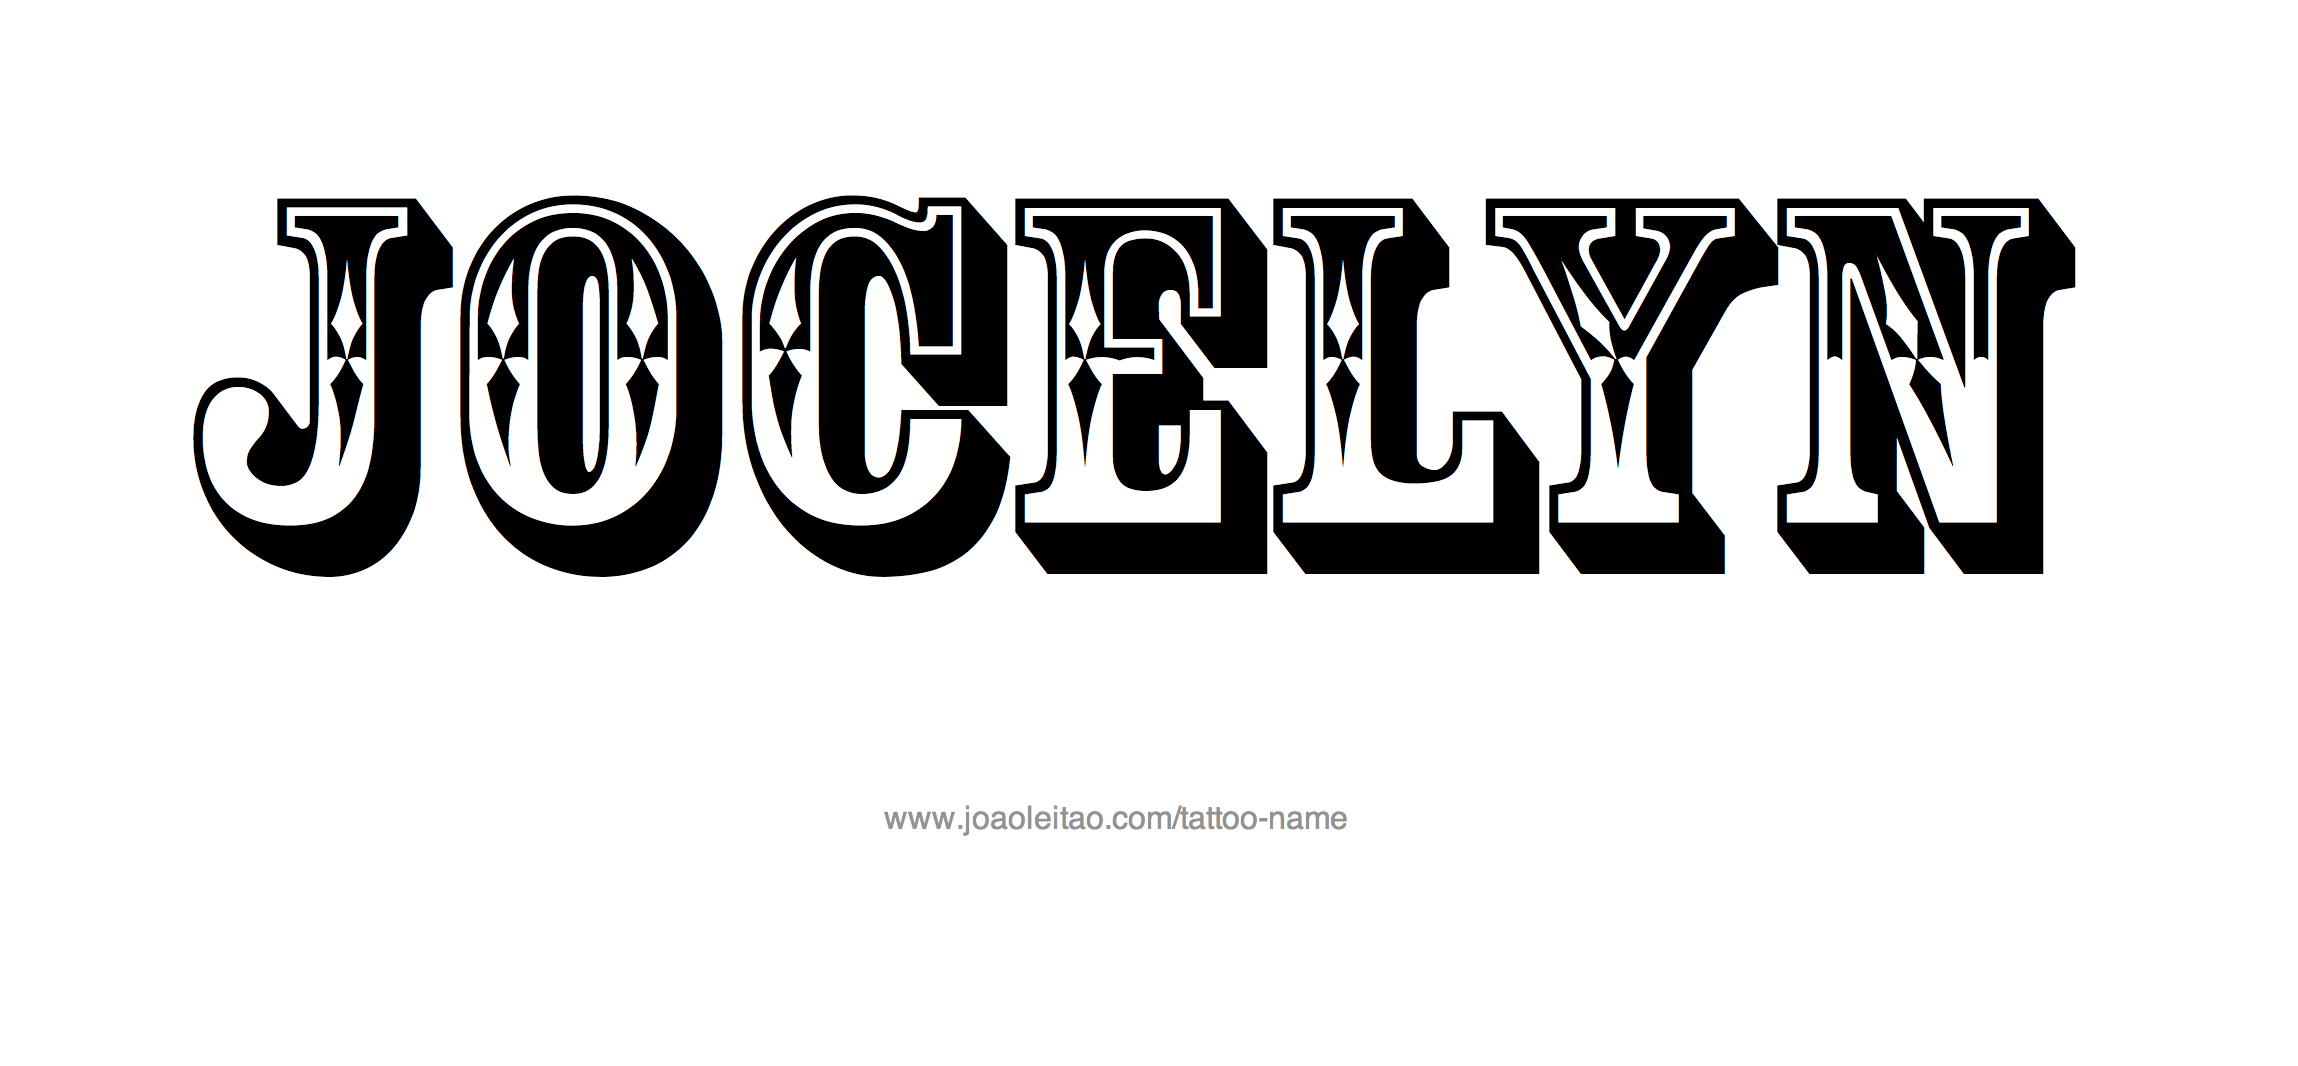 Jocelyn Name Tattoo Designs